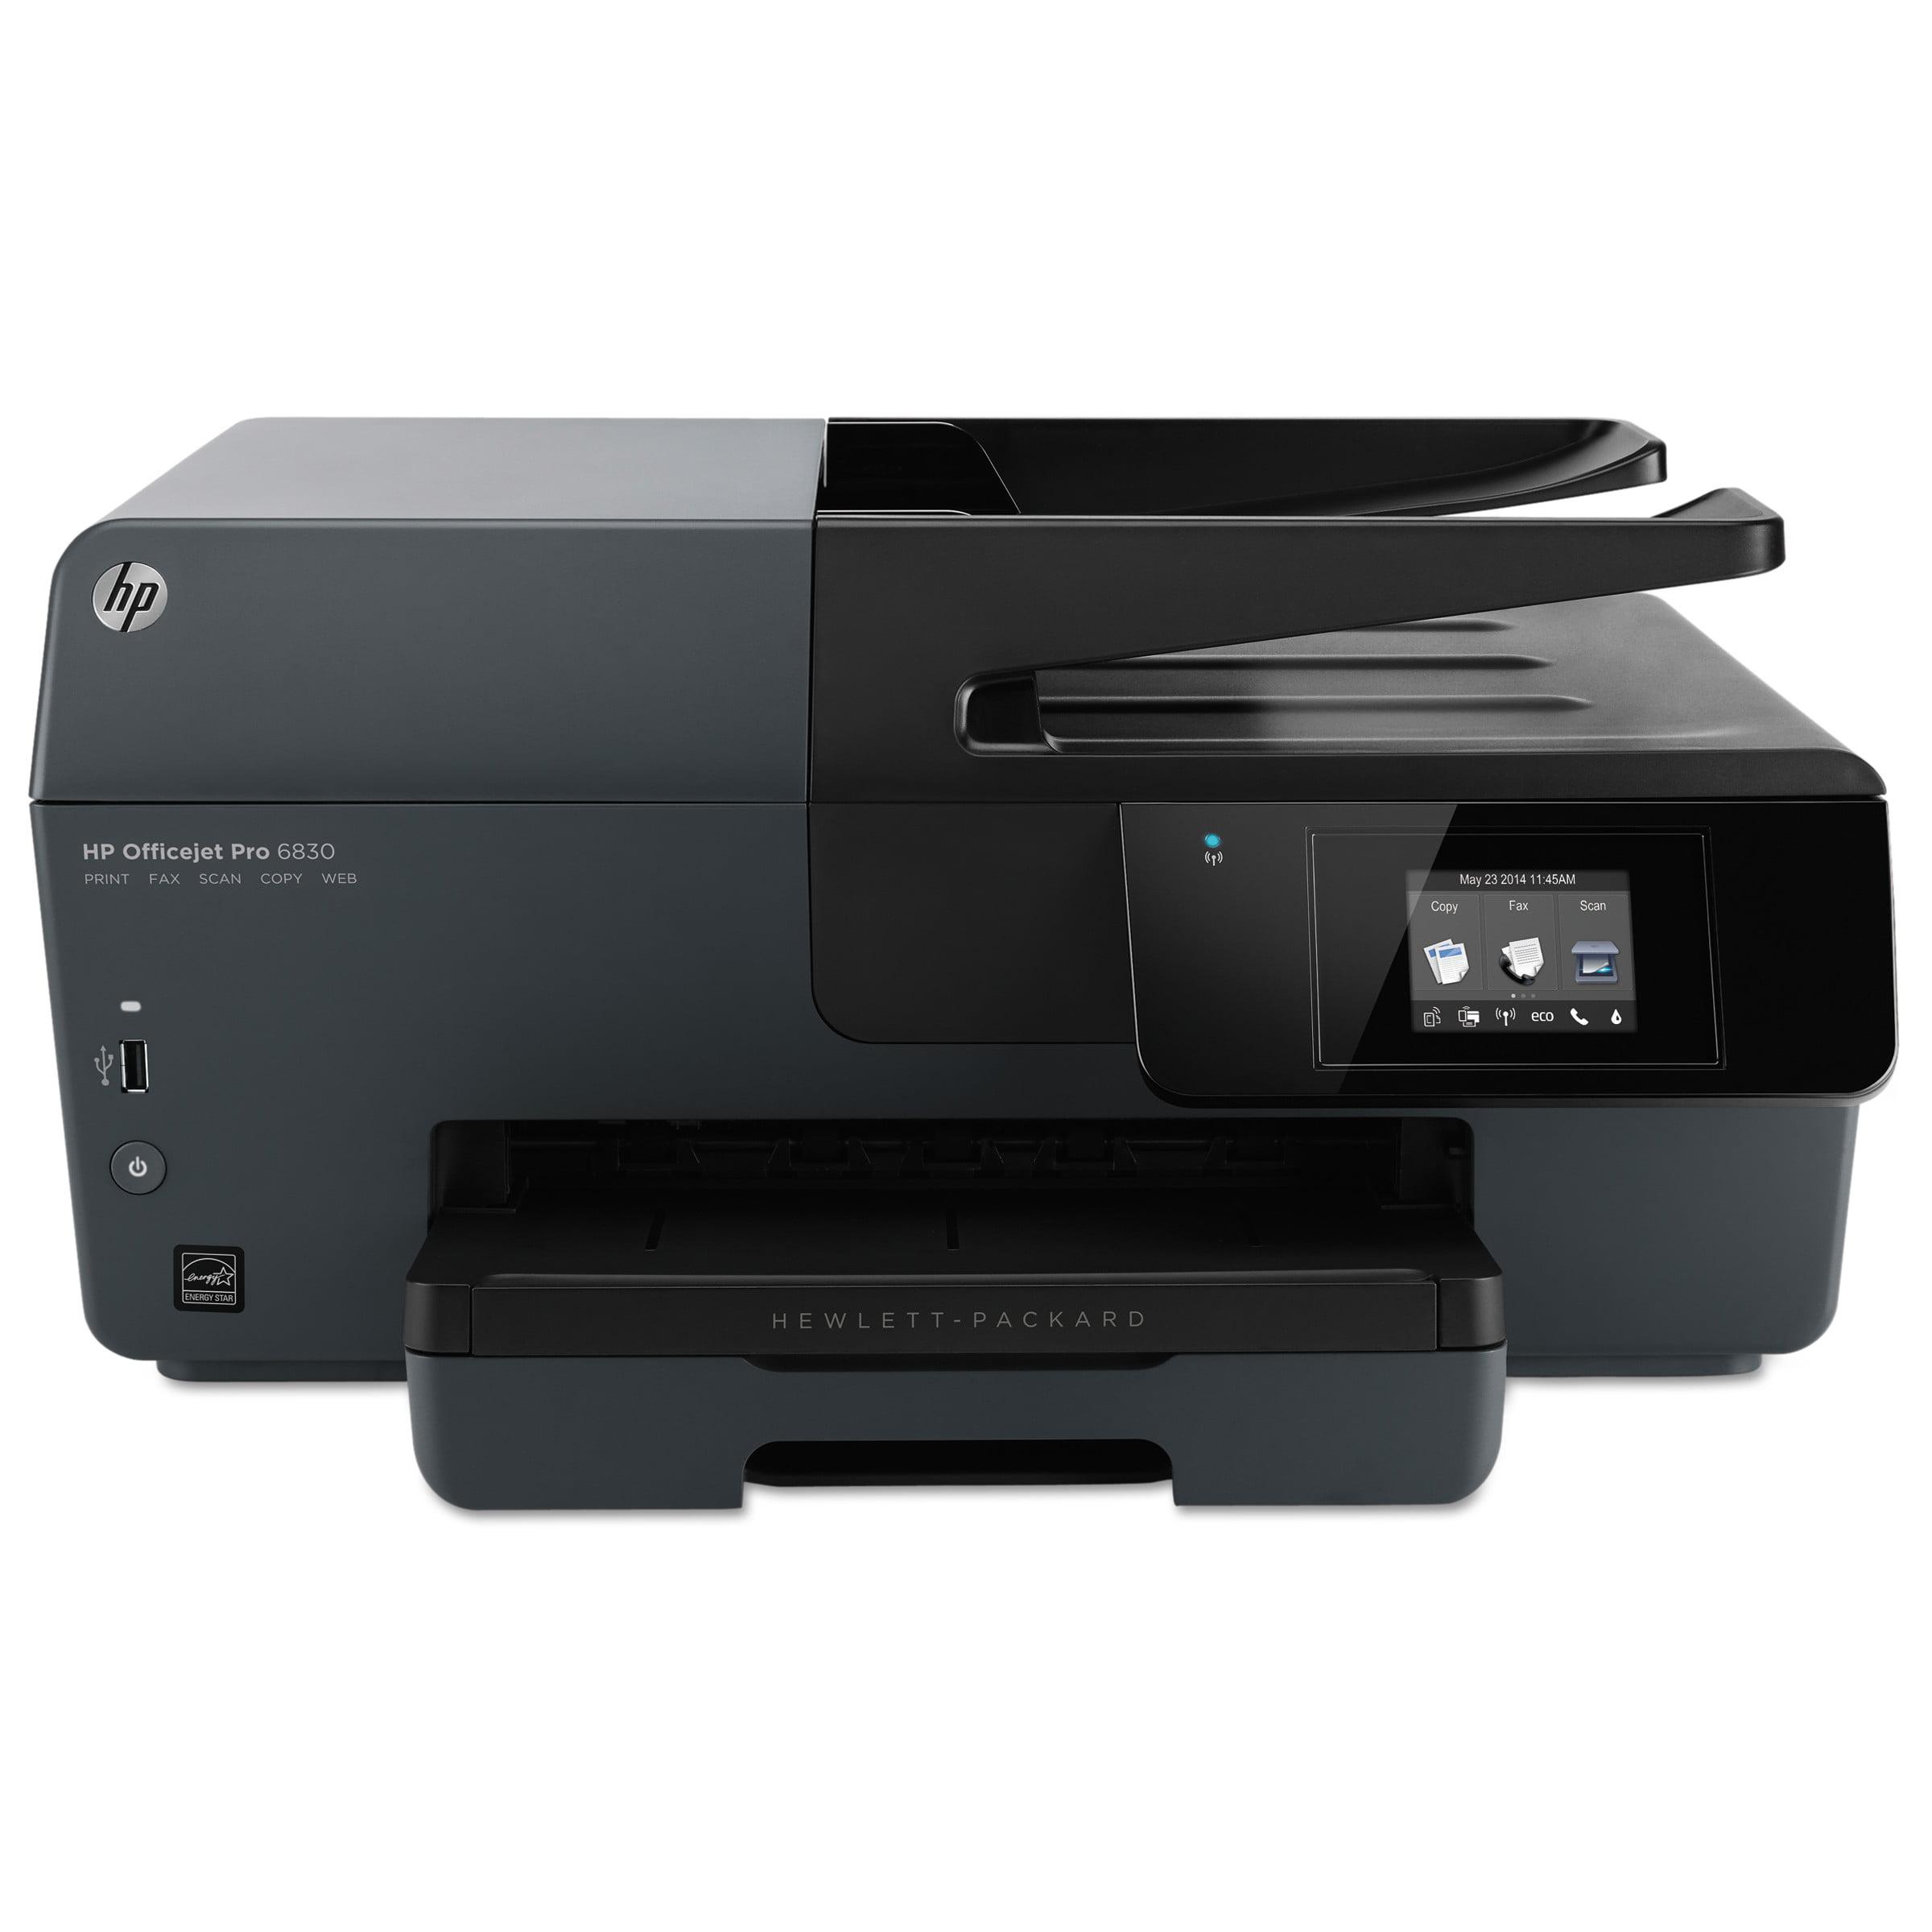 HP Officejet Pro 6830 e-All-in-One Inkjet Printer, Copy Fax Print Scan by HP